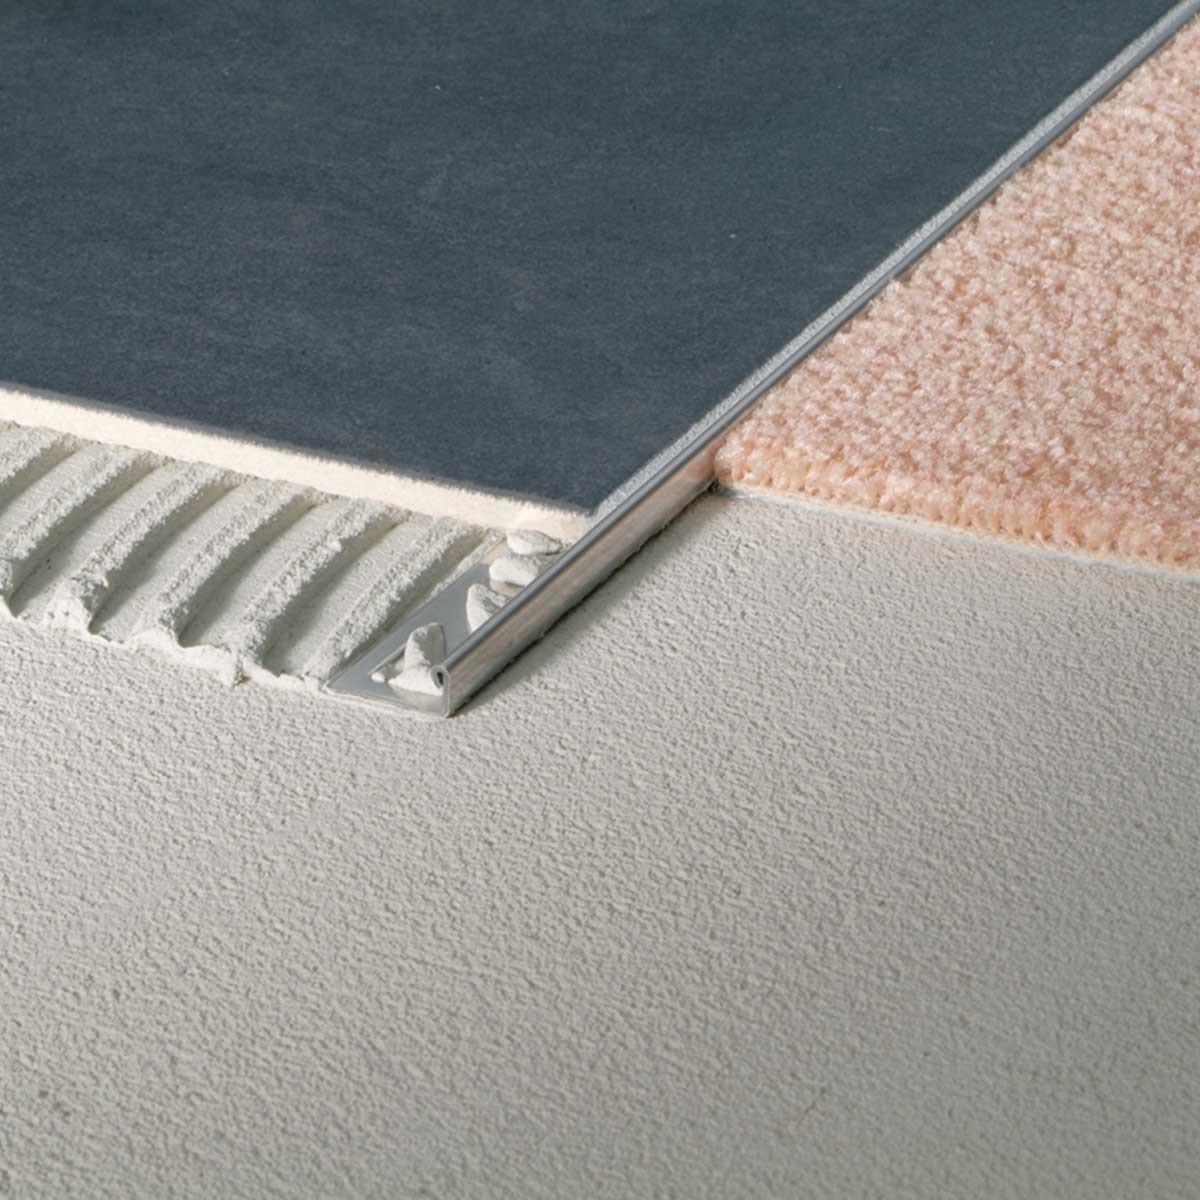 Blanke Aluminum Edge Protector Trims